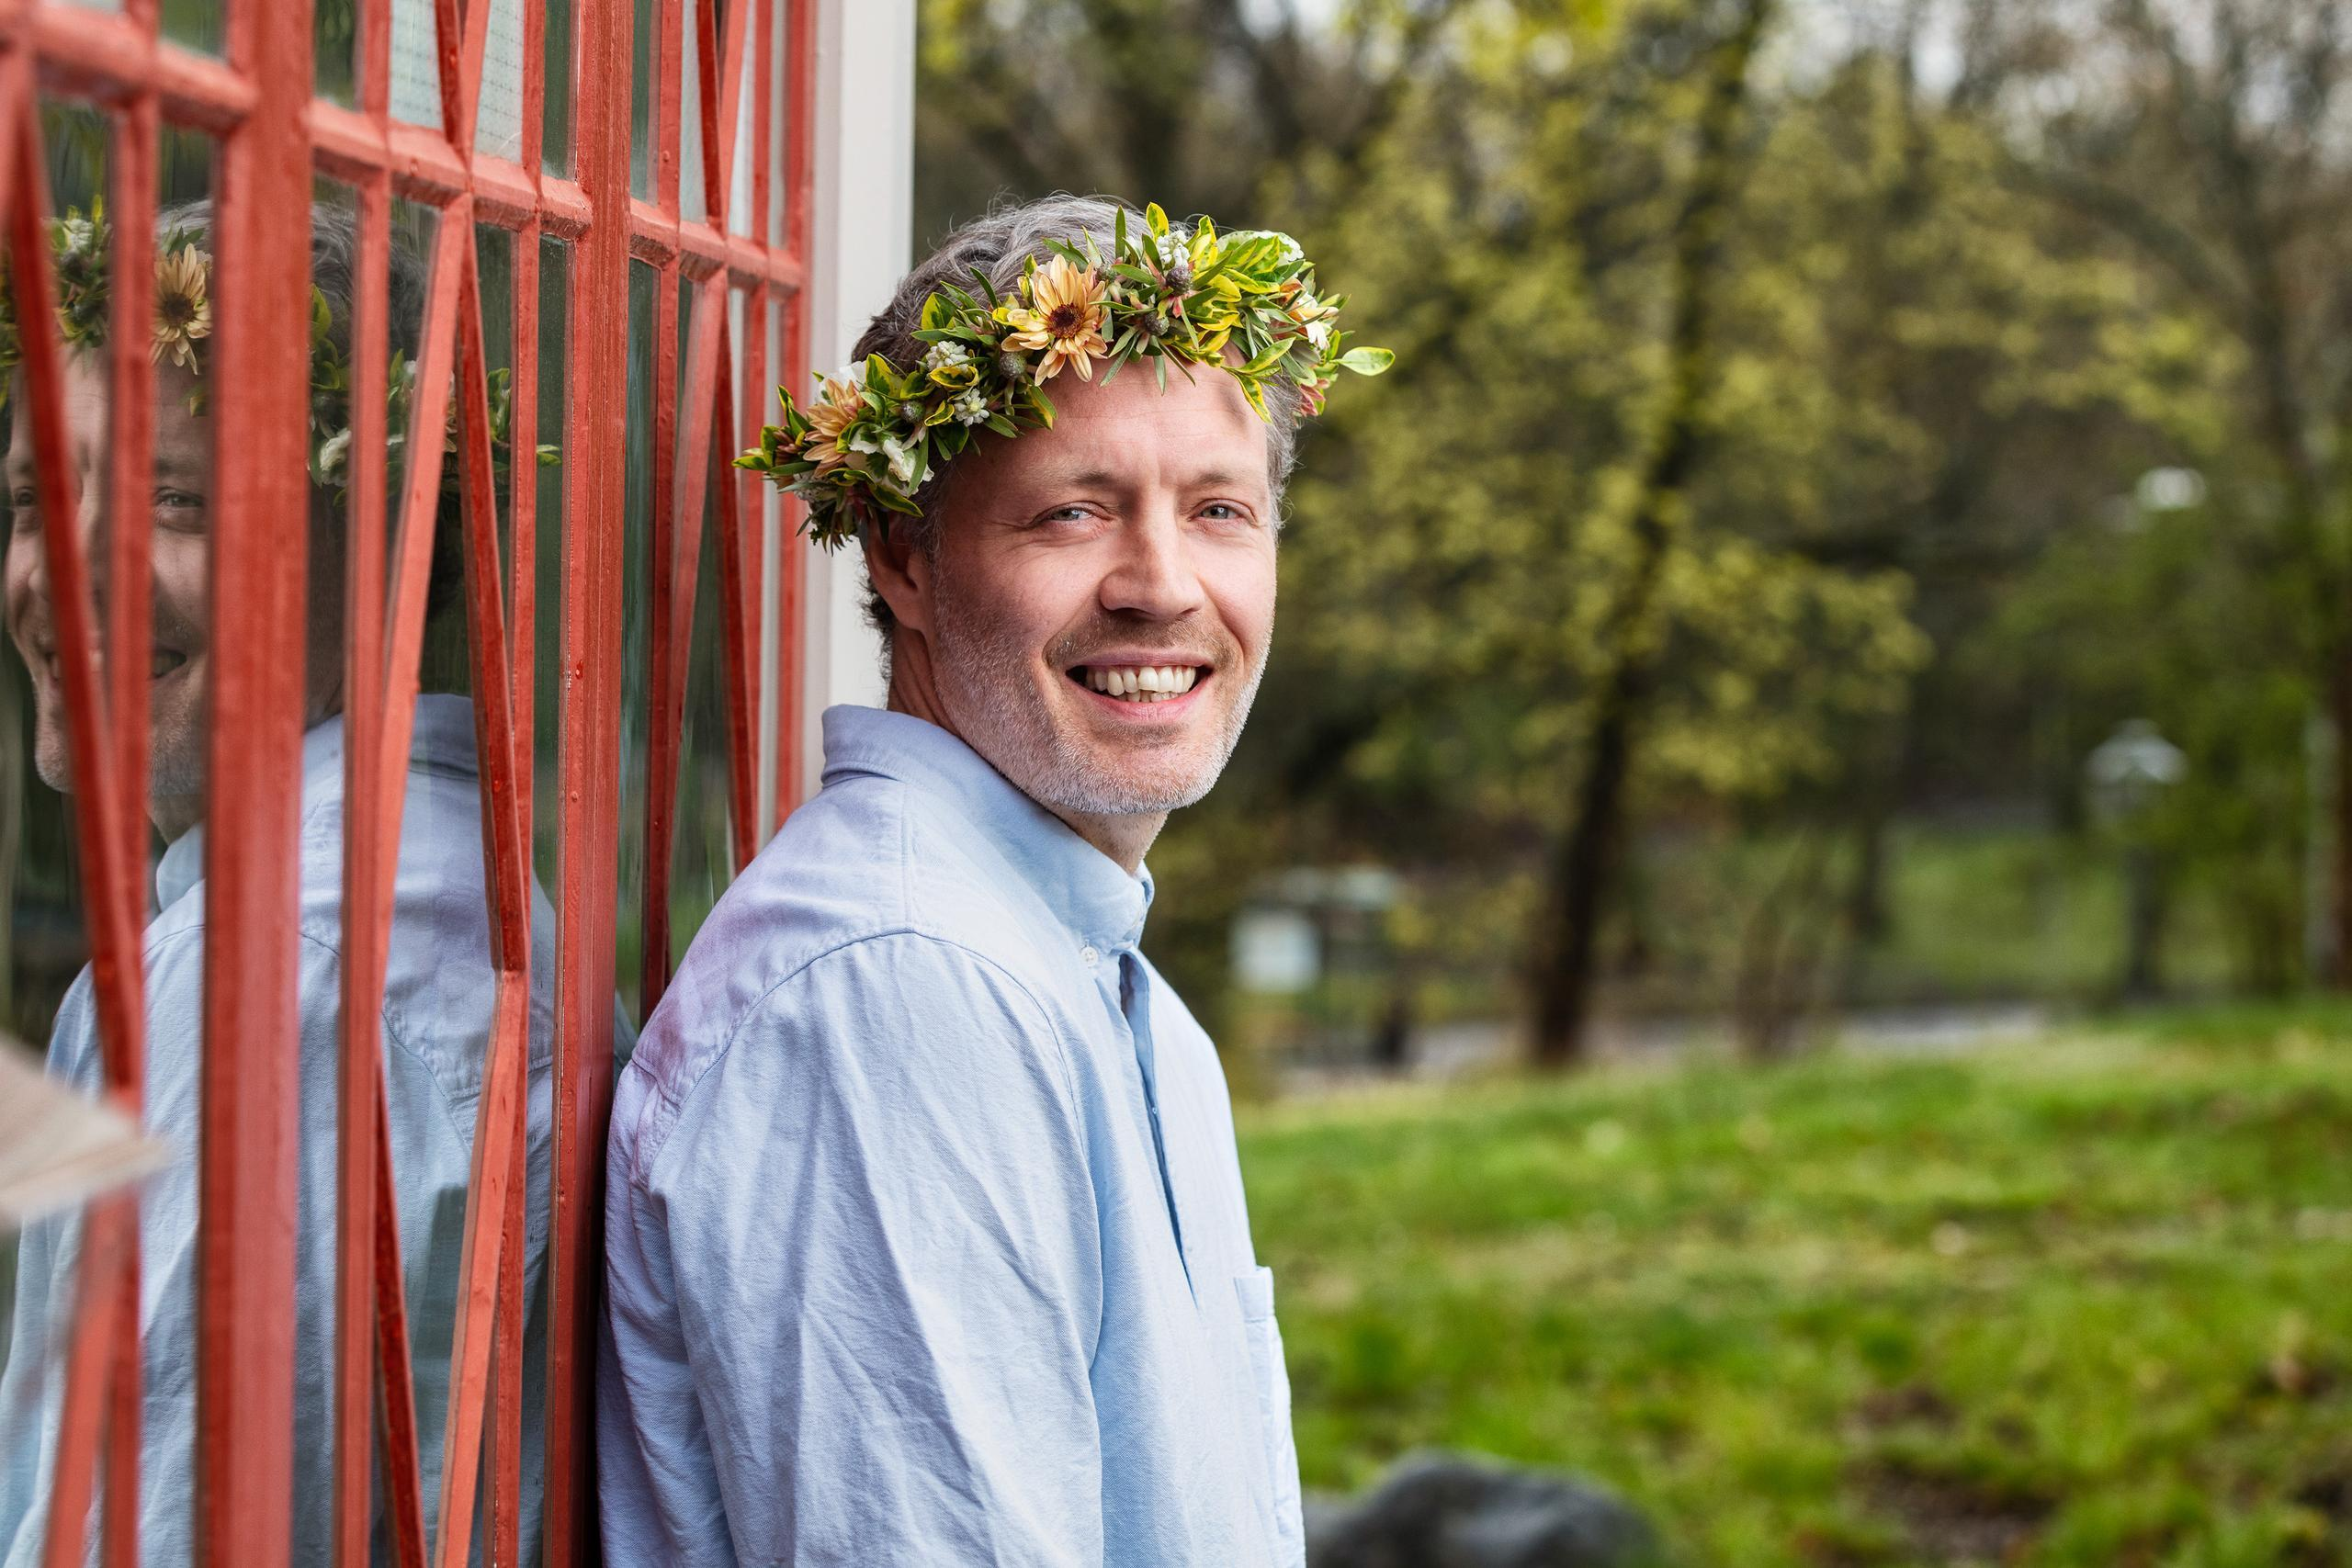 Recension: Sommar i P1 - Michael Lindgren